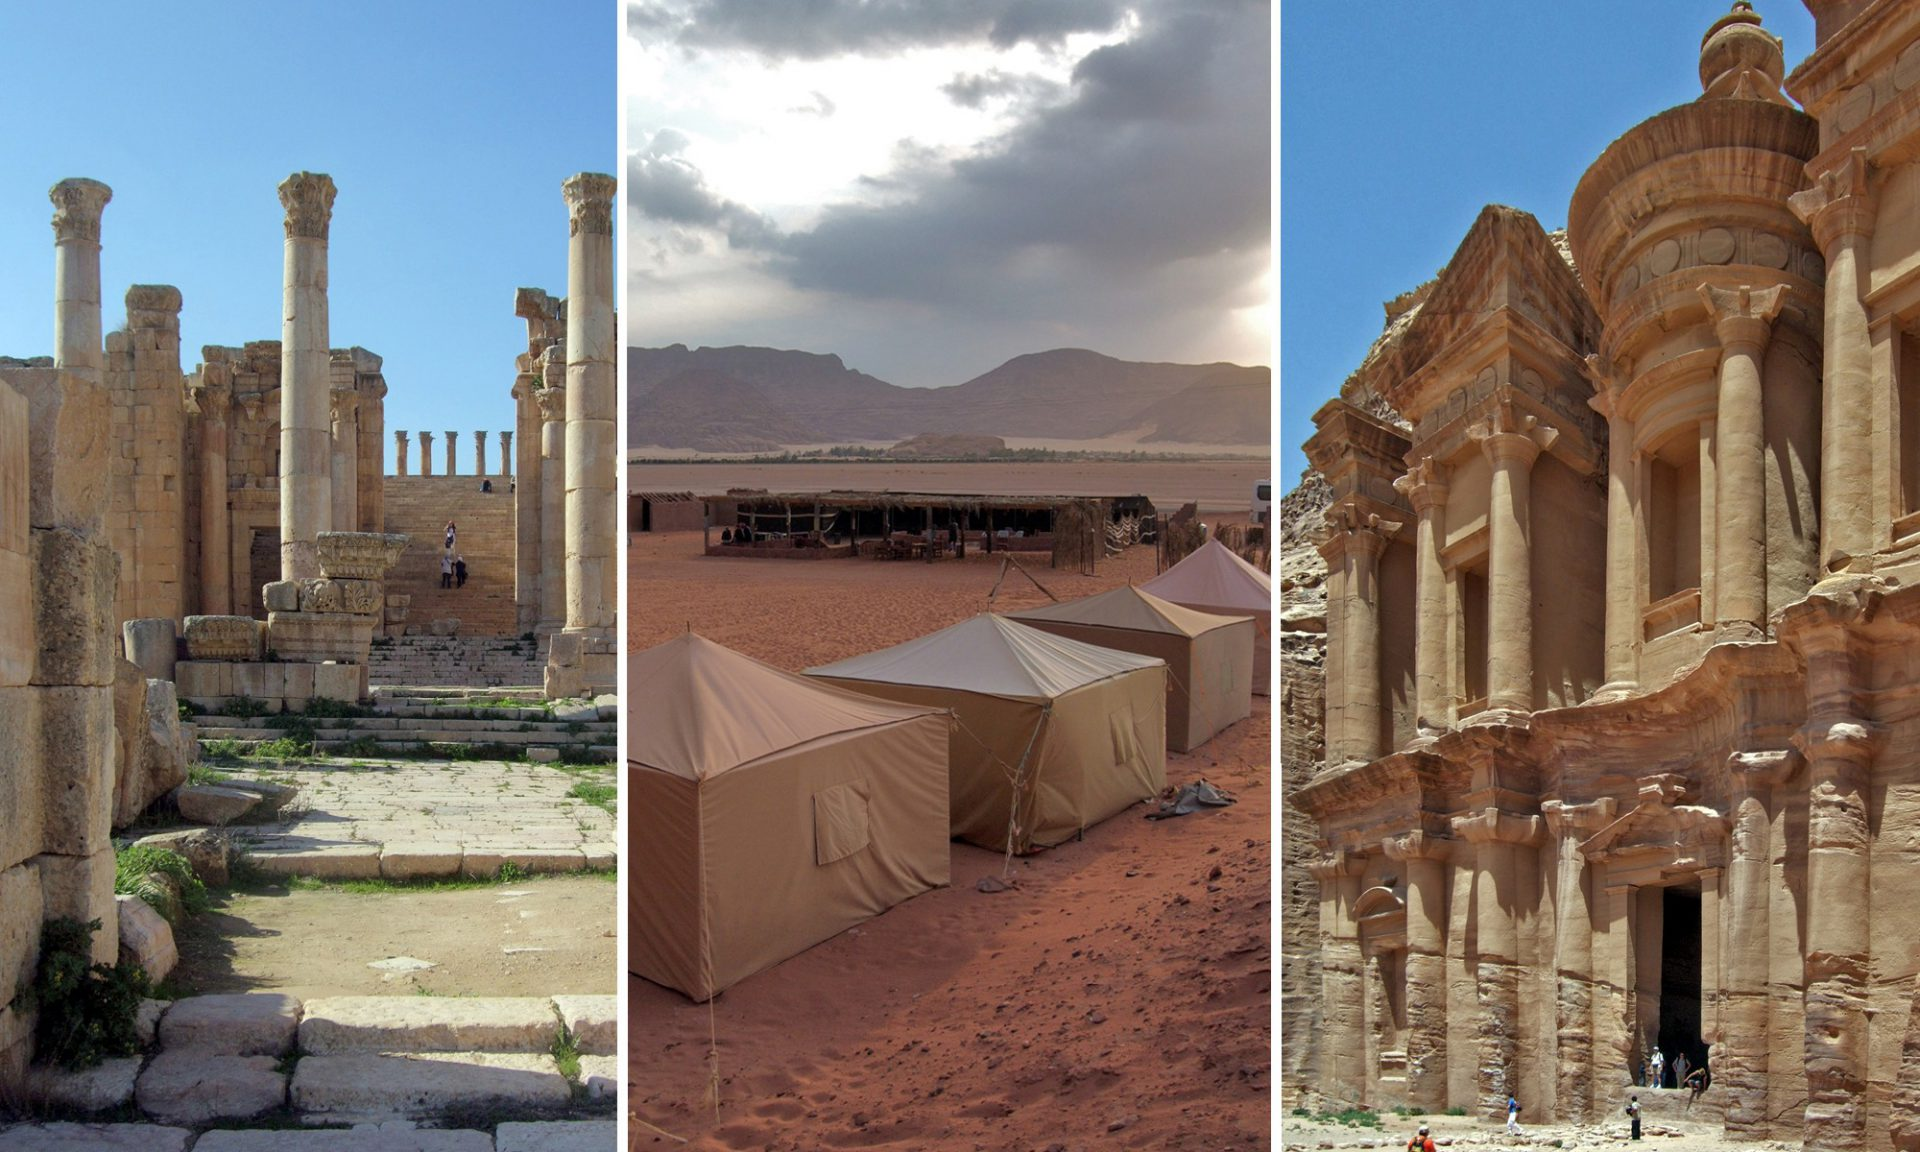 Surreales Jordanien. Die antike Stadt Jerasha, die rote Felsenwüste Wadi Rum und die steinerne Stadt Petra.